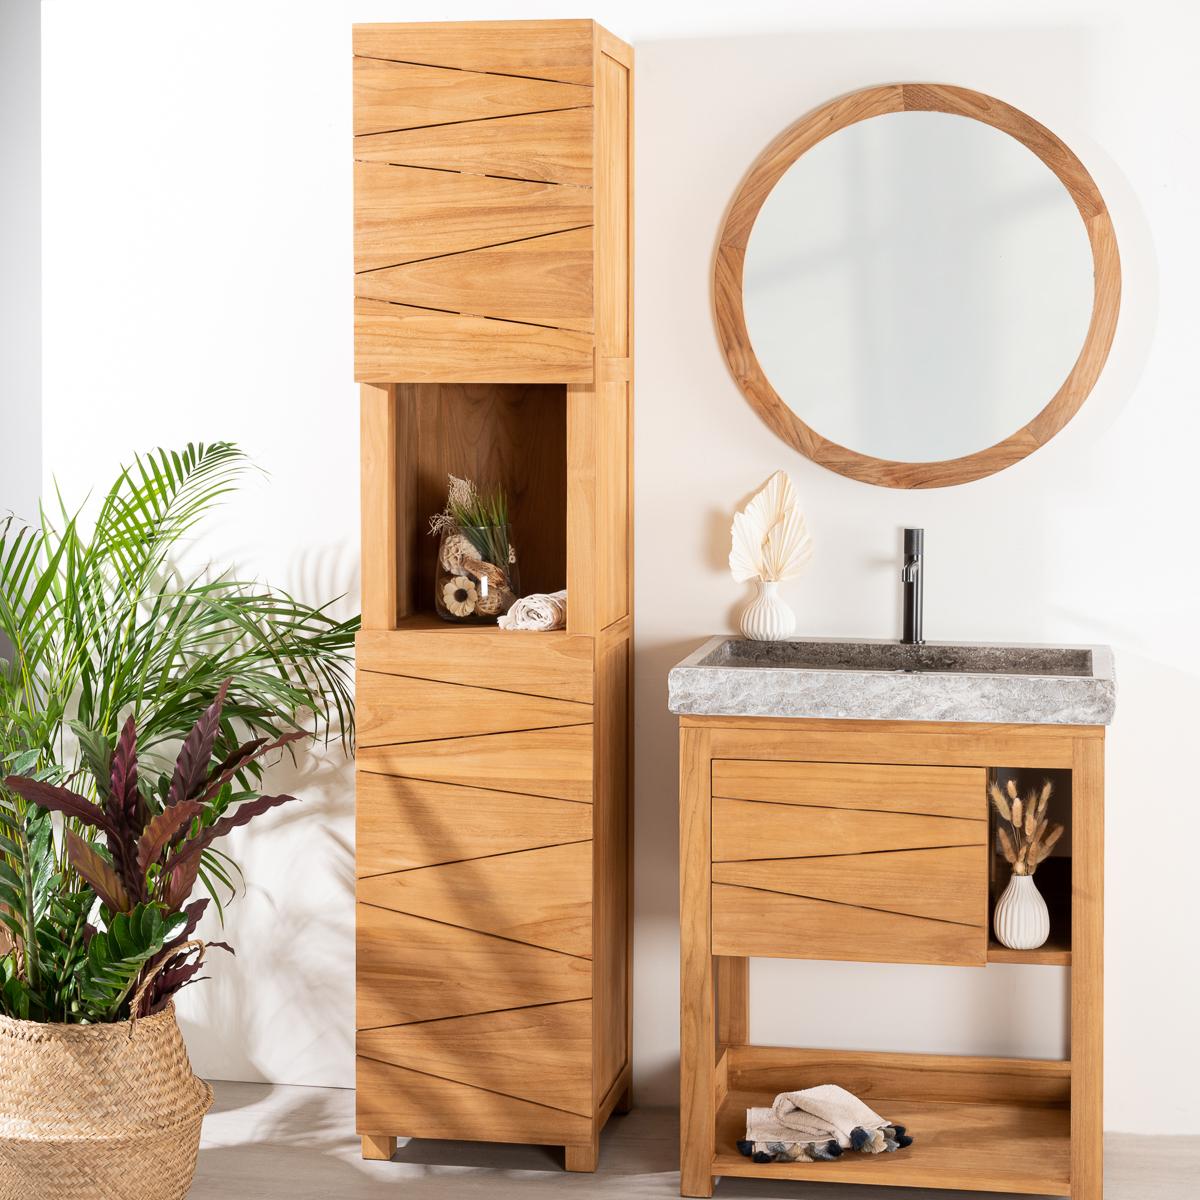 Colonne salle de bain en teck massif harmonie 190cm for Colonne de salle de bain moderne